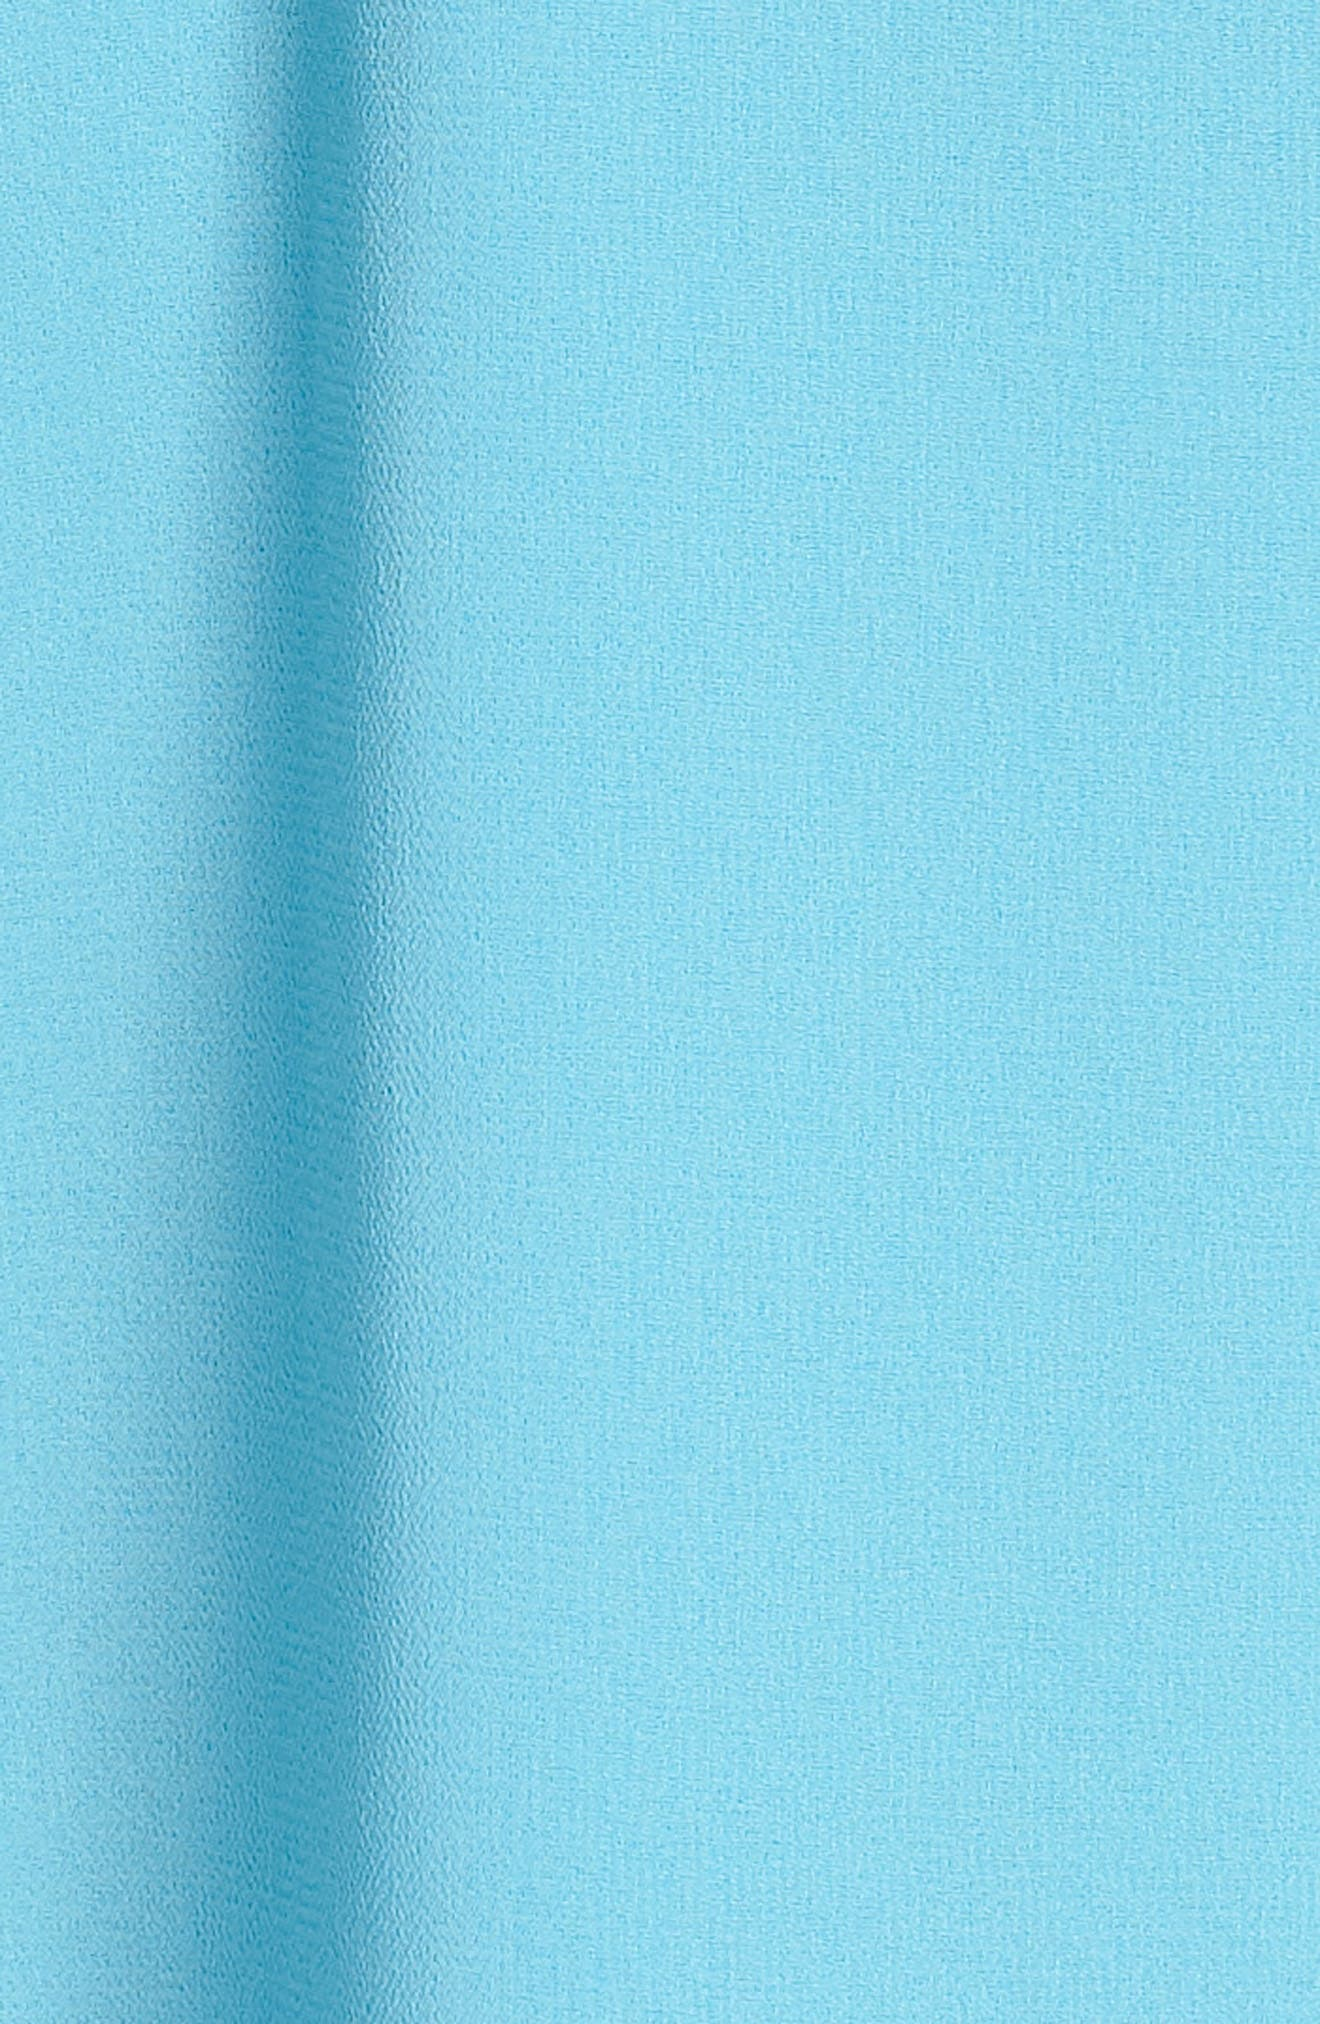 Off the Shoulder Ruffle & Tie Dress,                             Alternate thumbnail 6, color,                             414